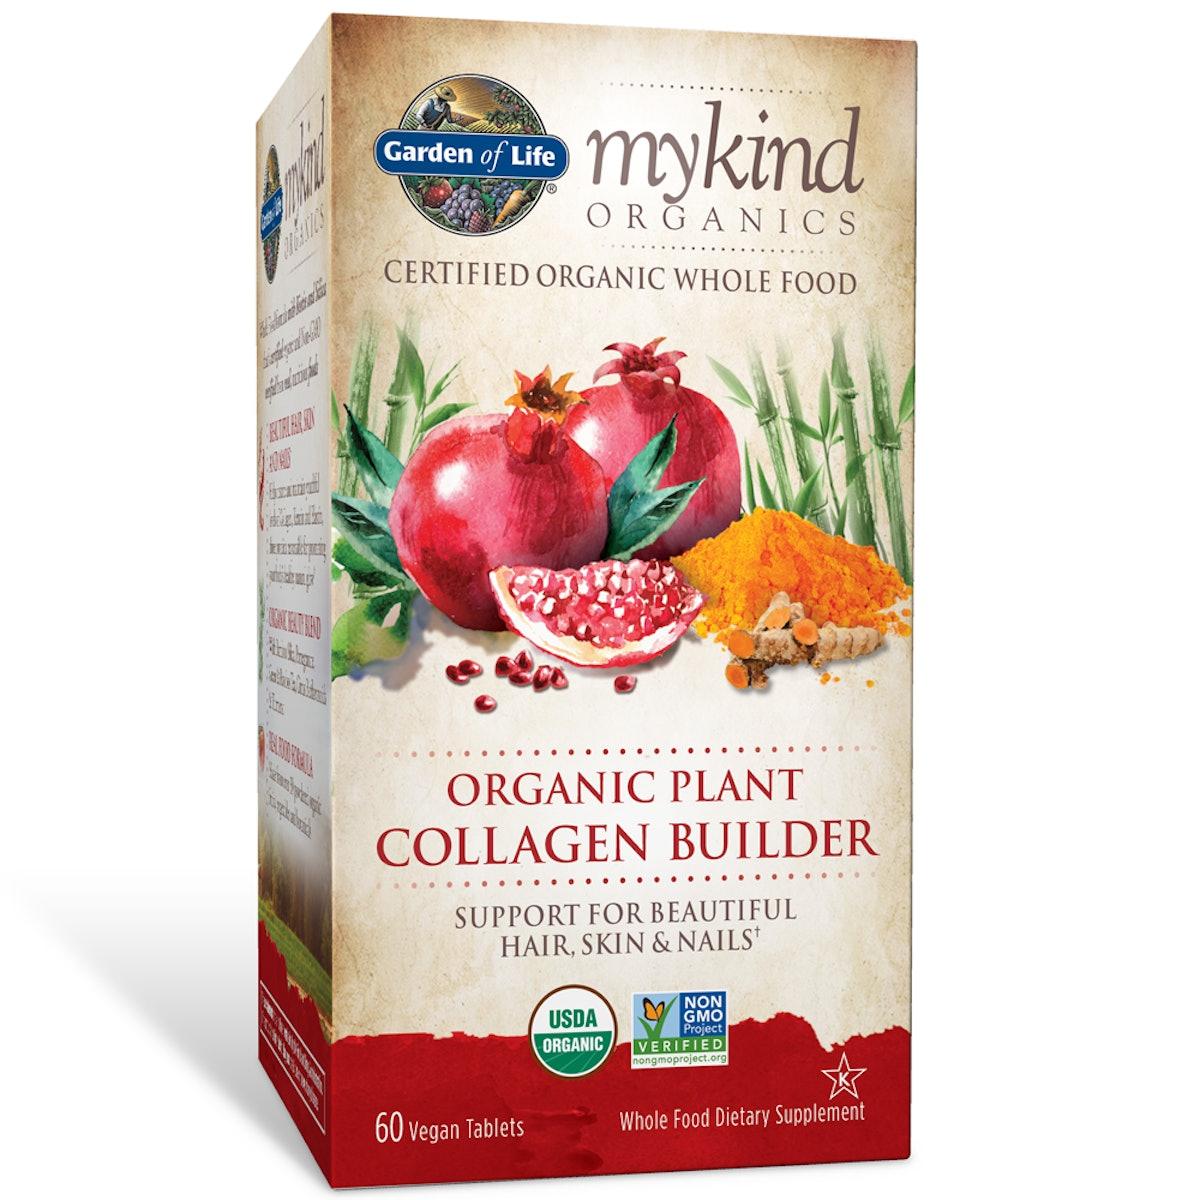 Garden of Life mykind Organics Organic Plant Collagen Builder 60 Tablets